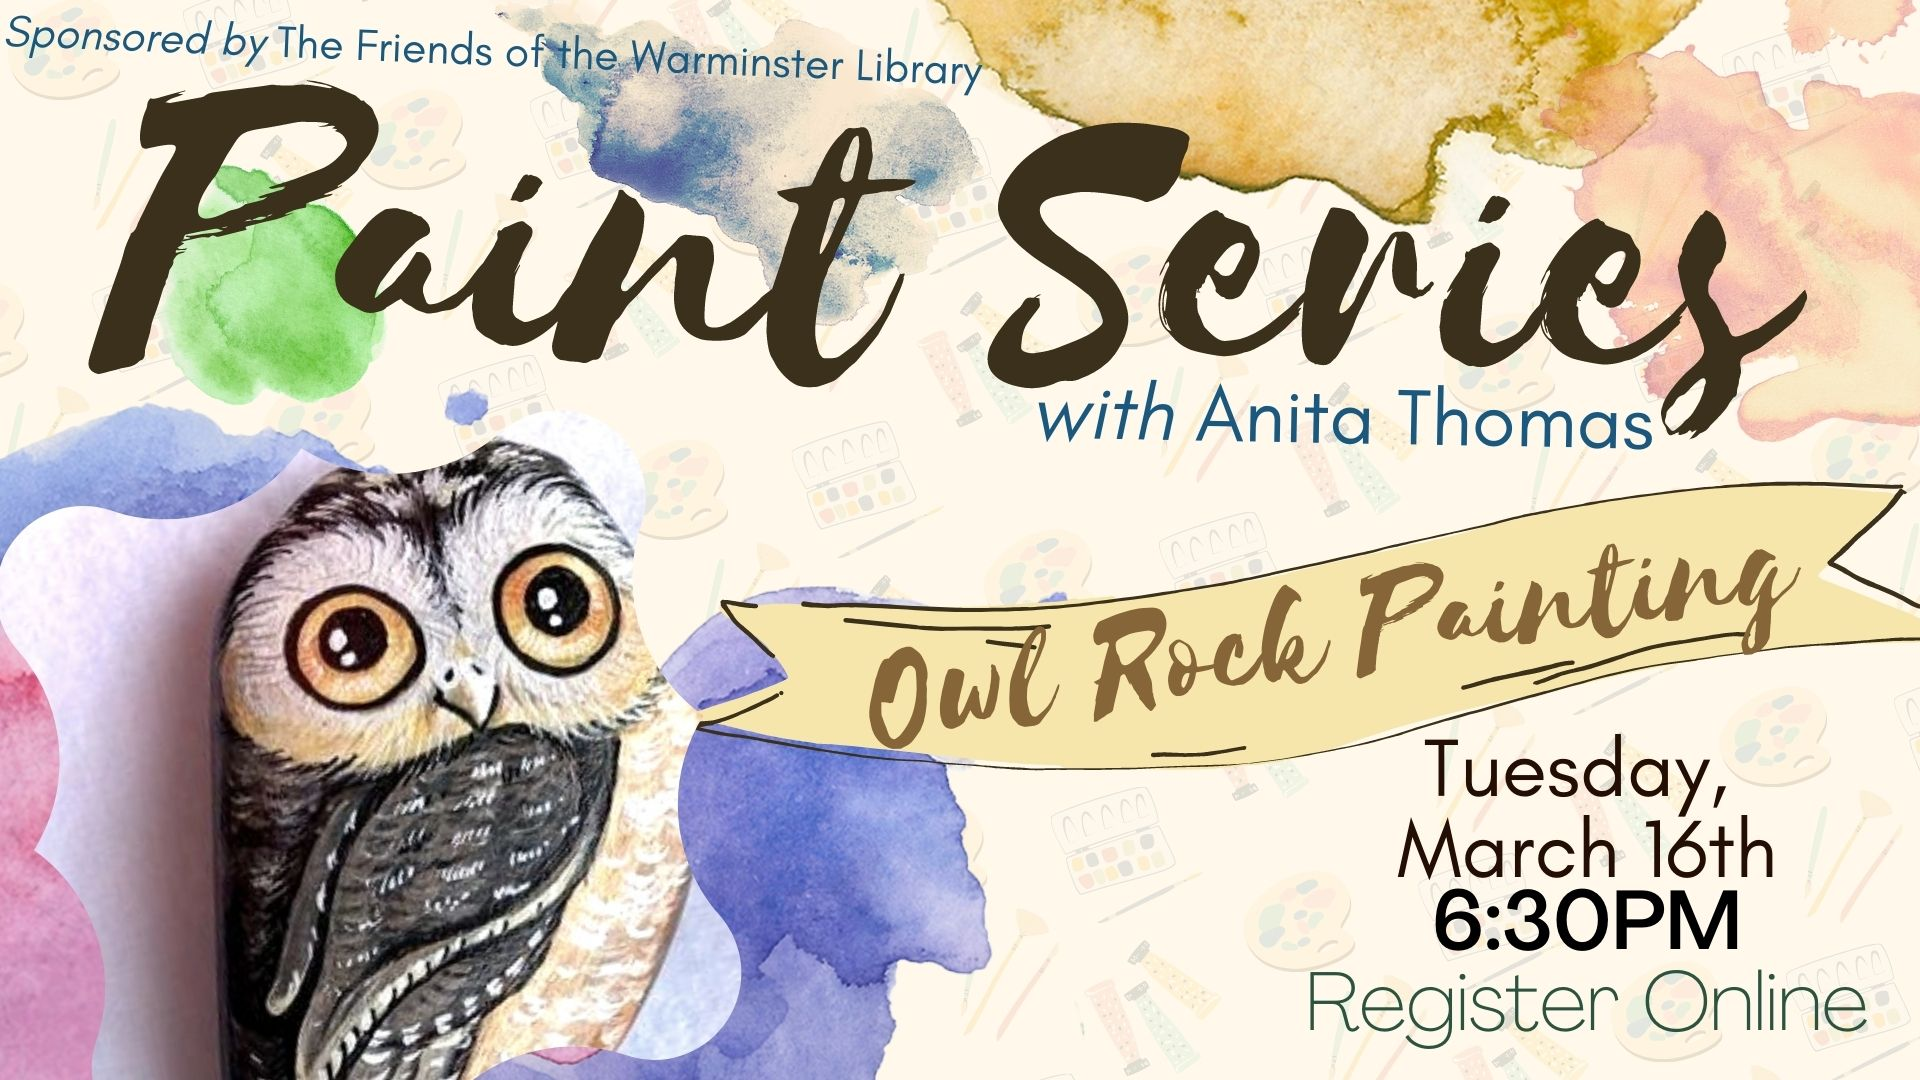 Painting Series: Owl Rock Painting